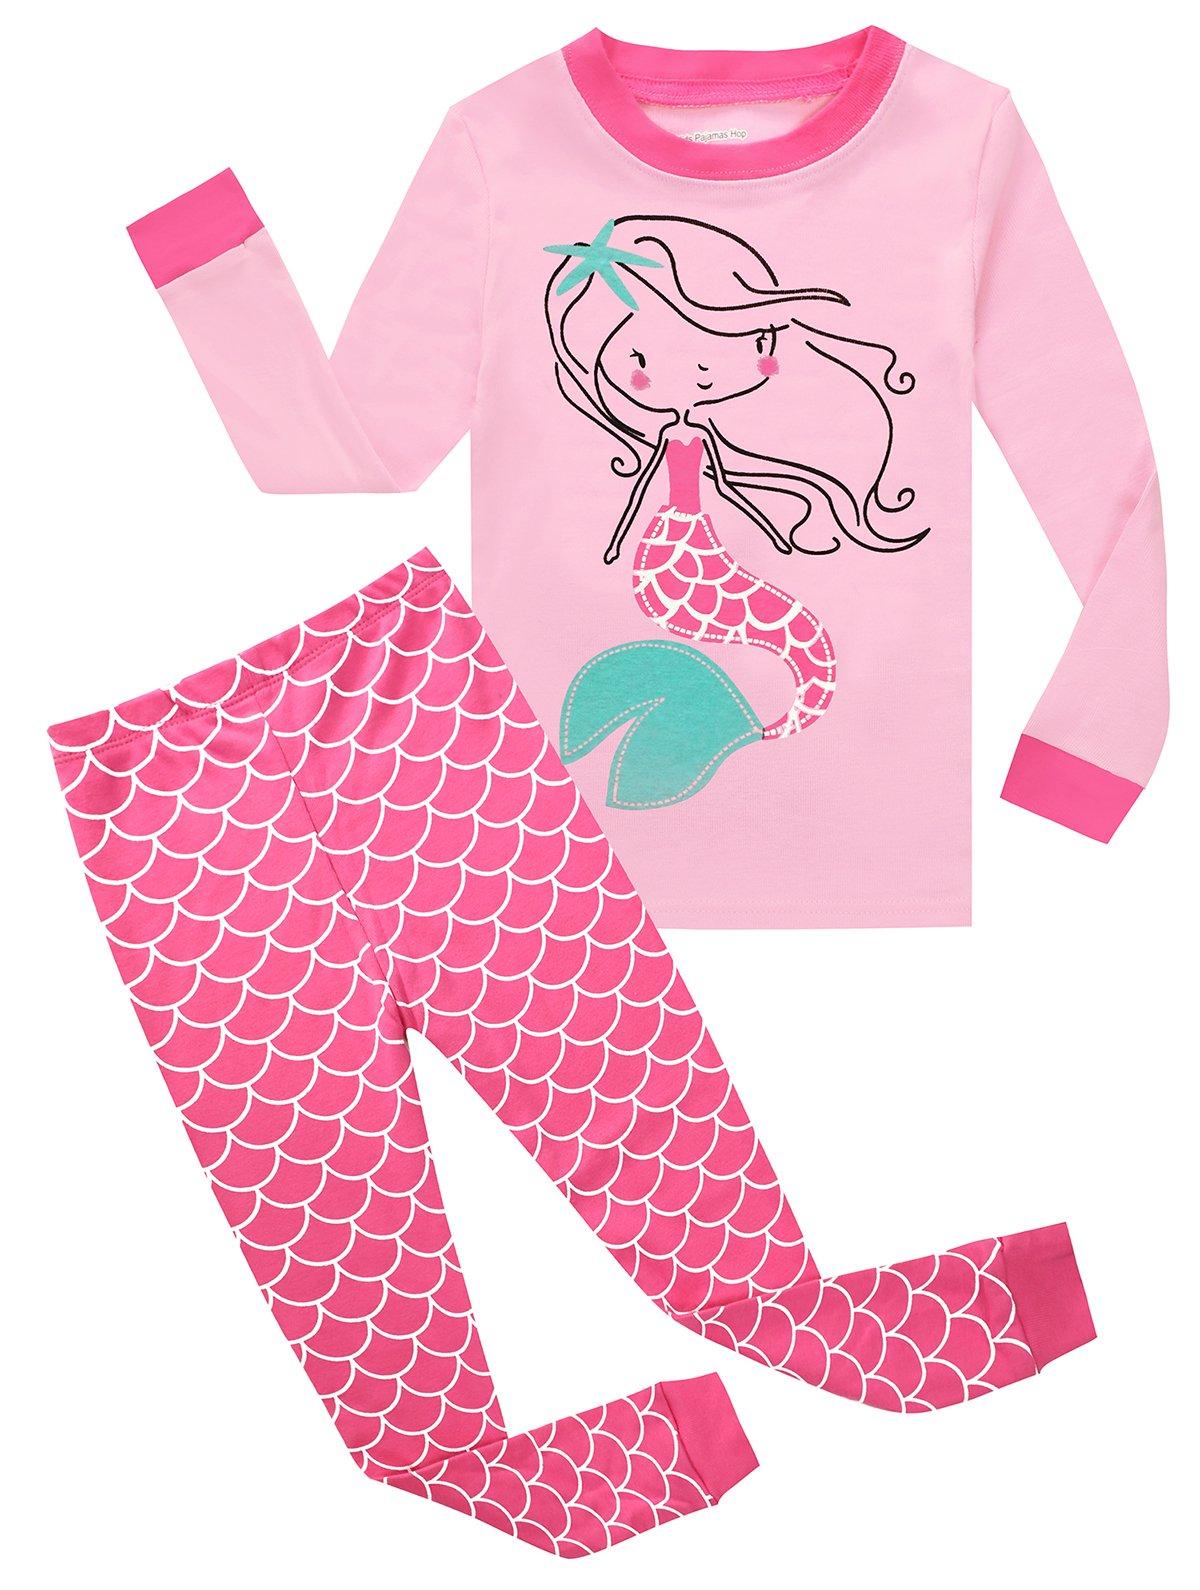 Kids Pajamas Hop Girls Mermaid Pajamas Kids 2 Piece Pants Set Childrens Pjs Long Sleeve (Pink,7T)